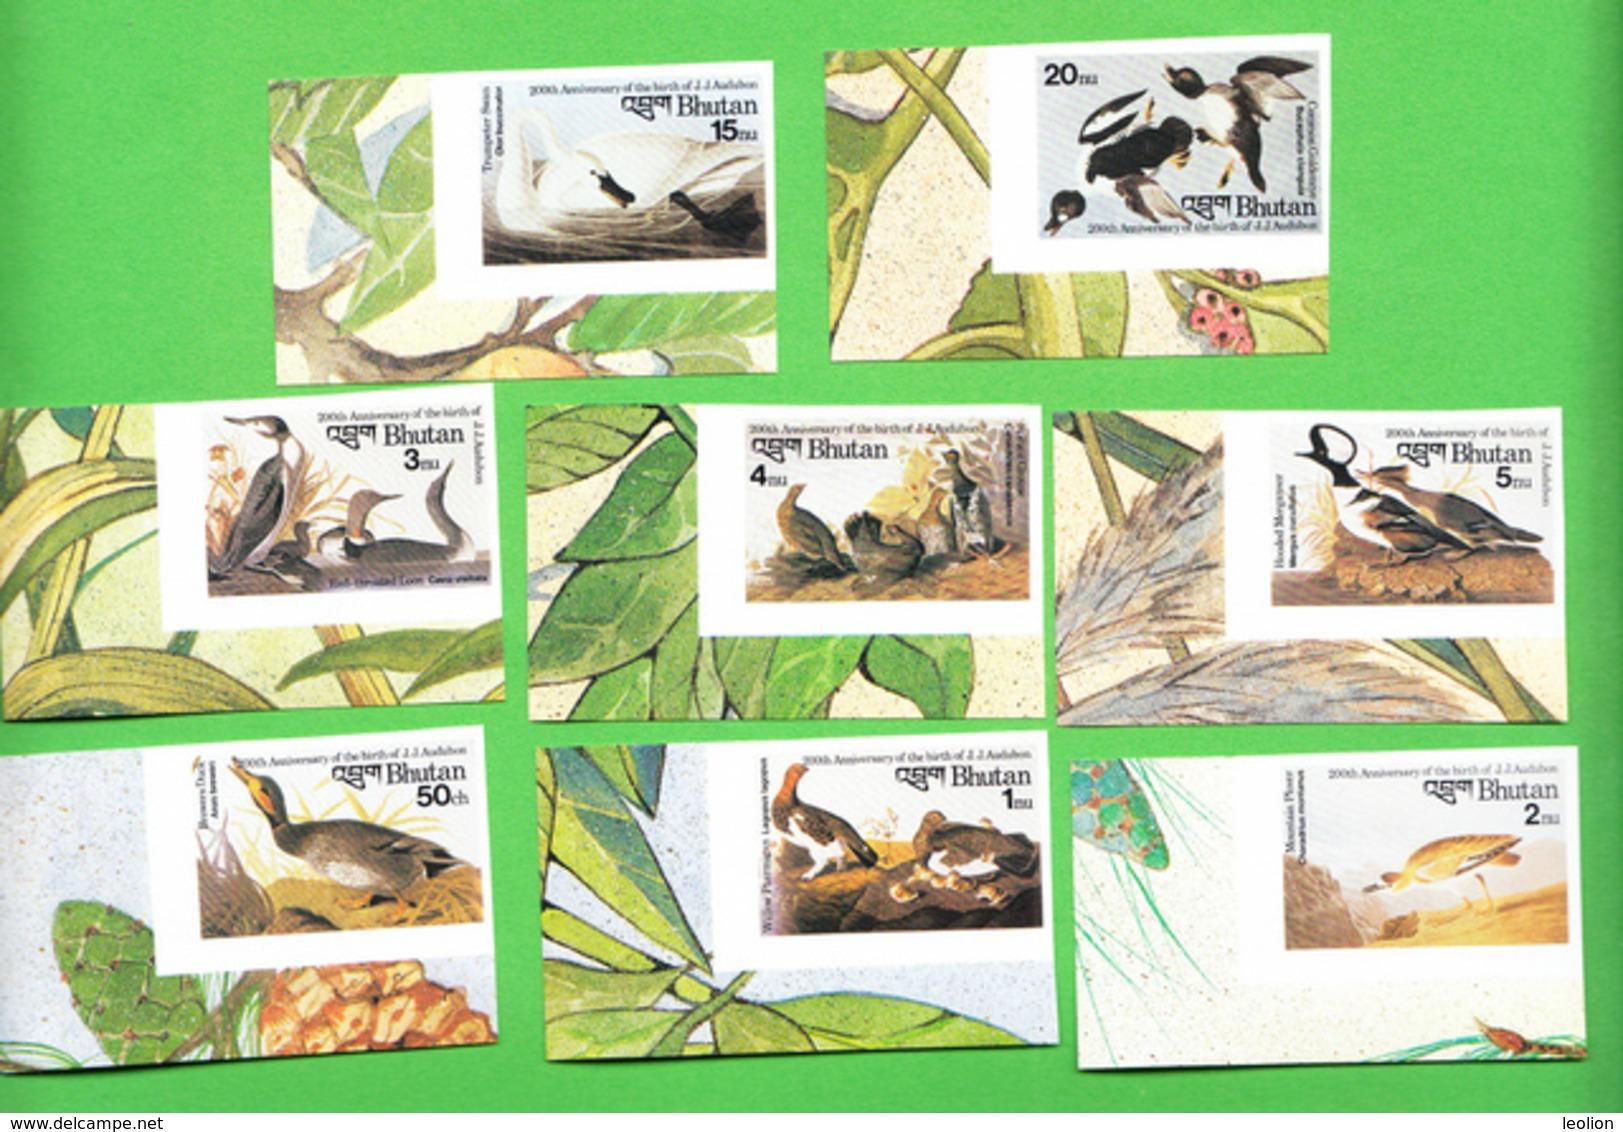 BHUTAN Imperforated Stamps IMPERF 1985 Audubon Birds Oiseaux Scott 506 - 513, 8 Values MNH Bhoutan #2 - Bhutan